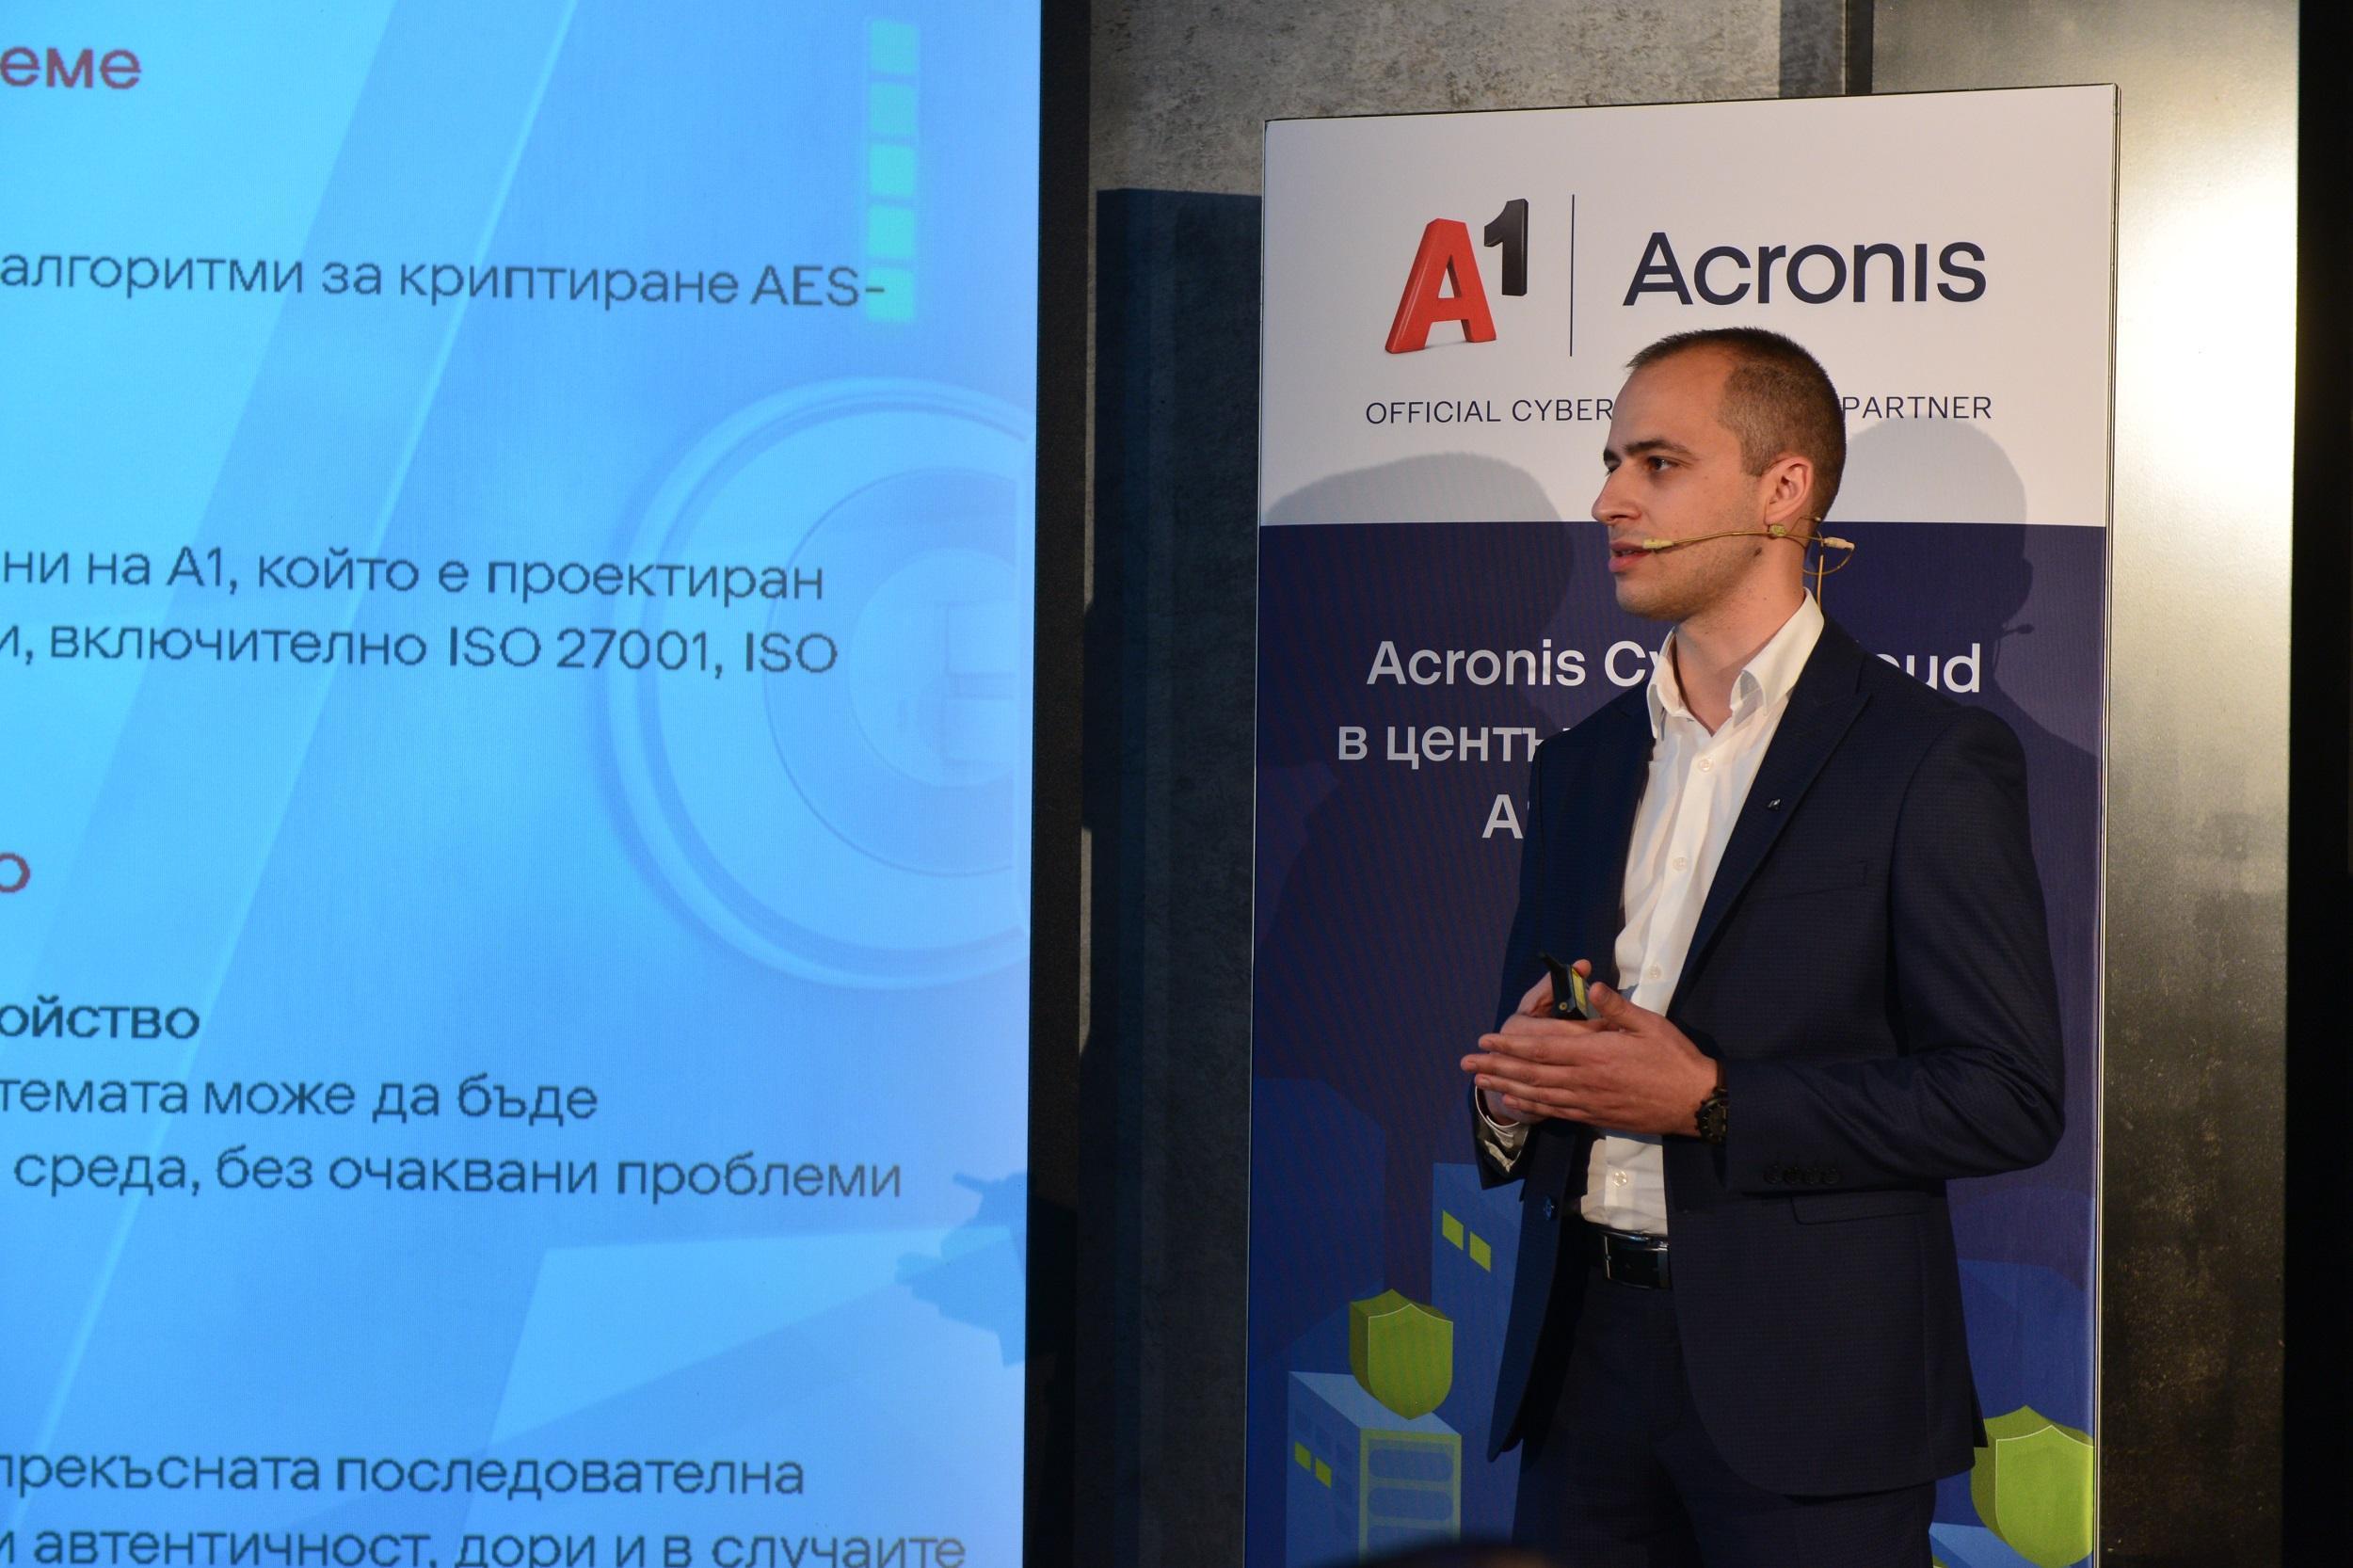 A1 Acronis